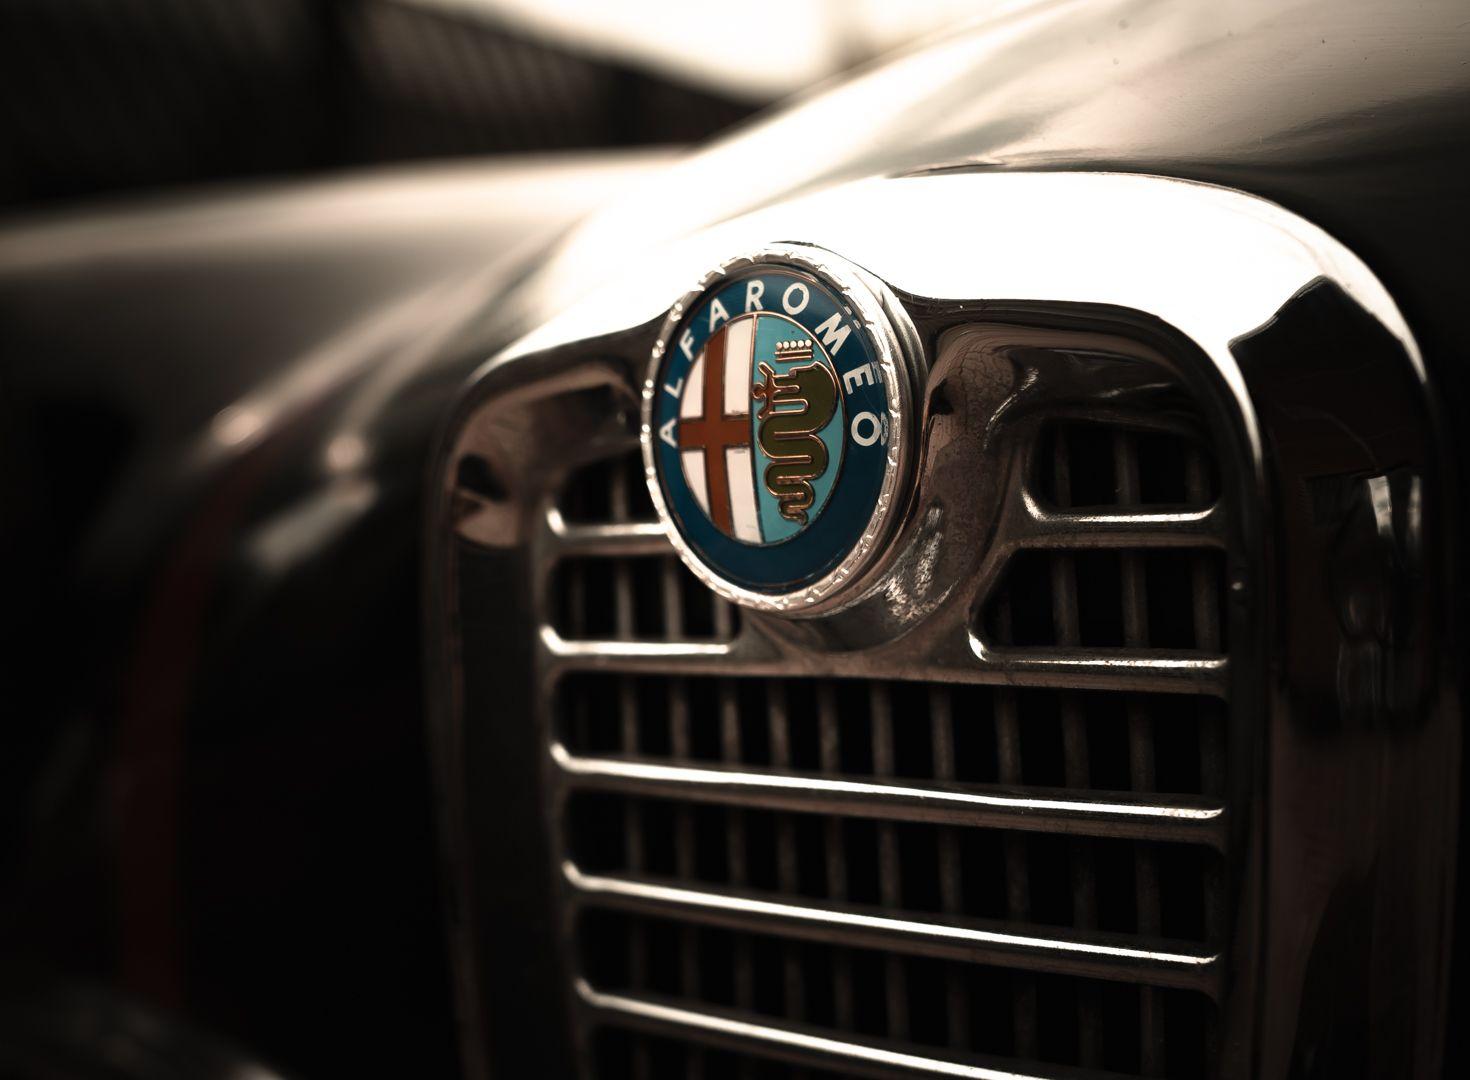 1962 Alfa Romeo Giulietta Sprint 1300 Race Car 69397